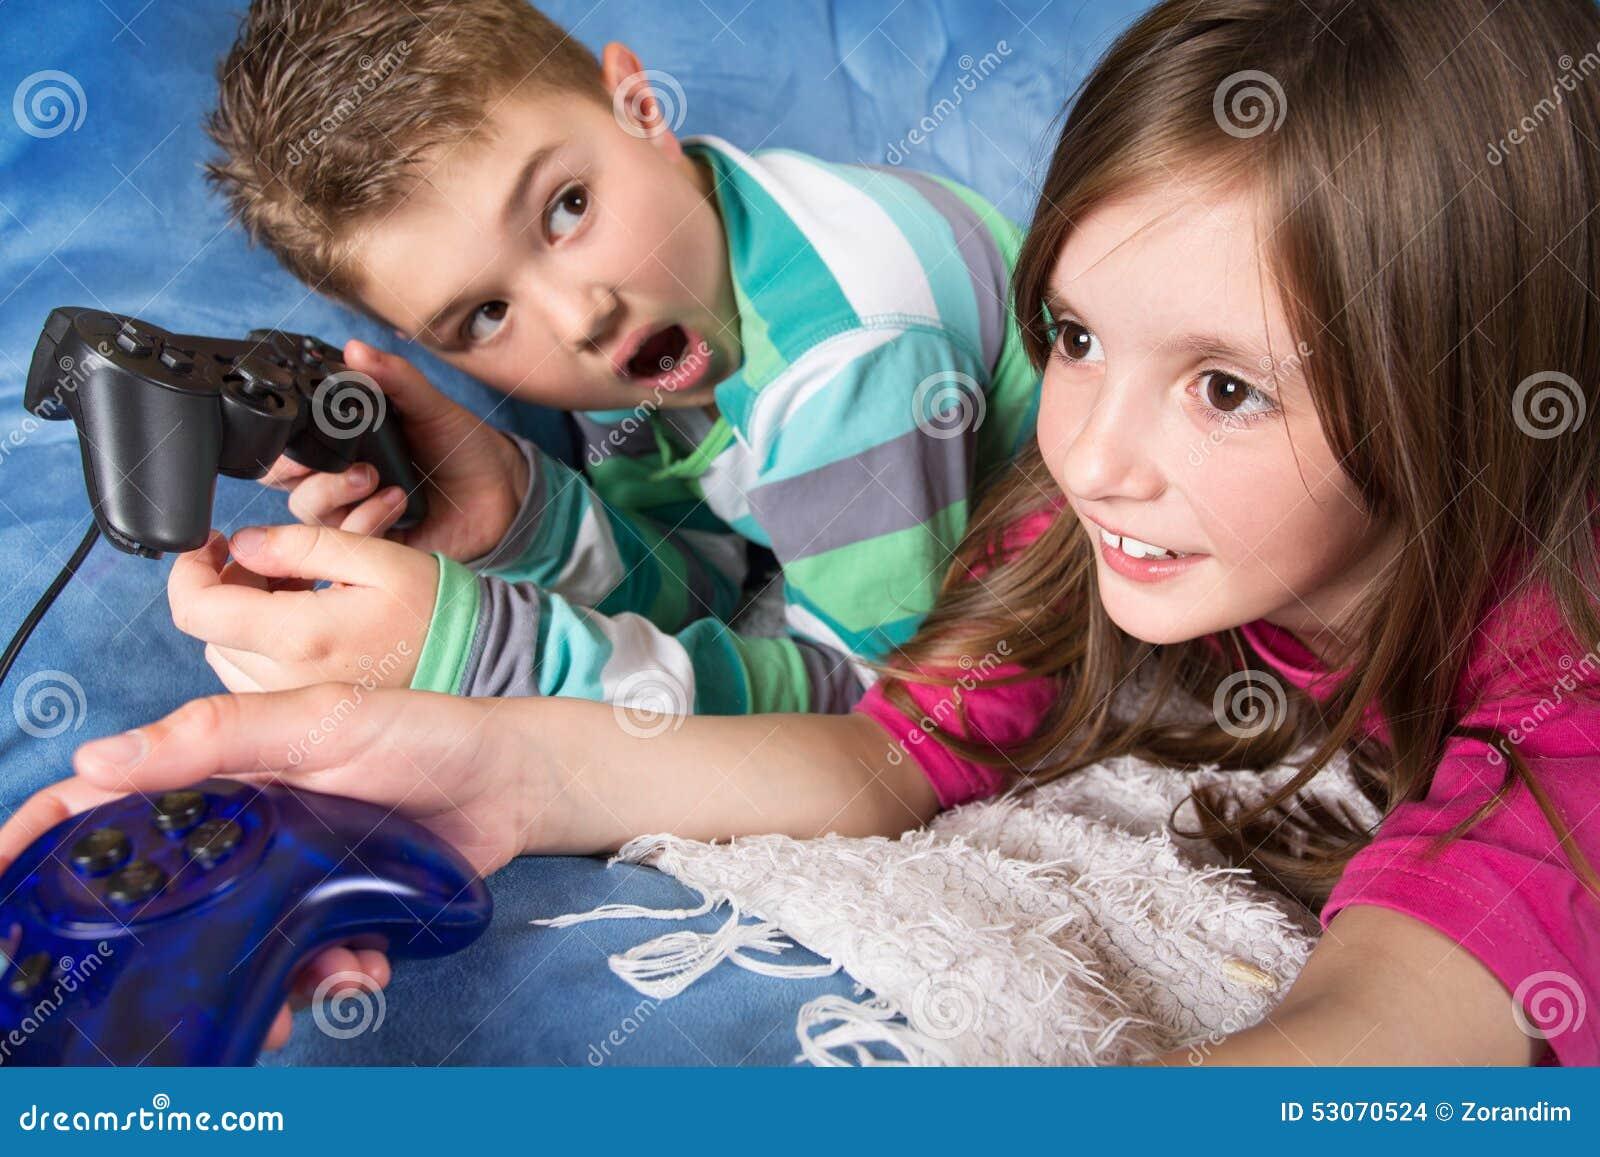 Small child games